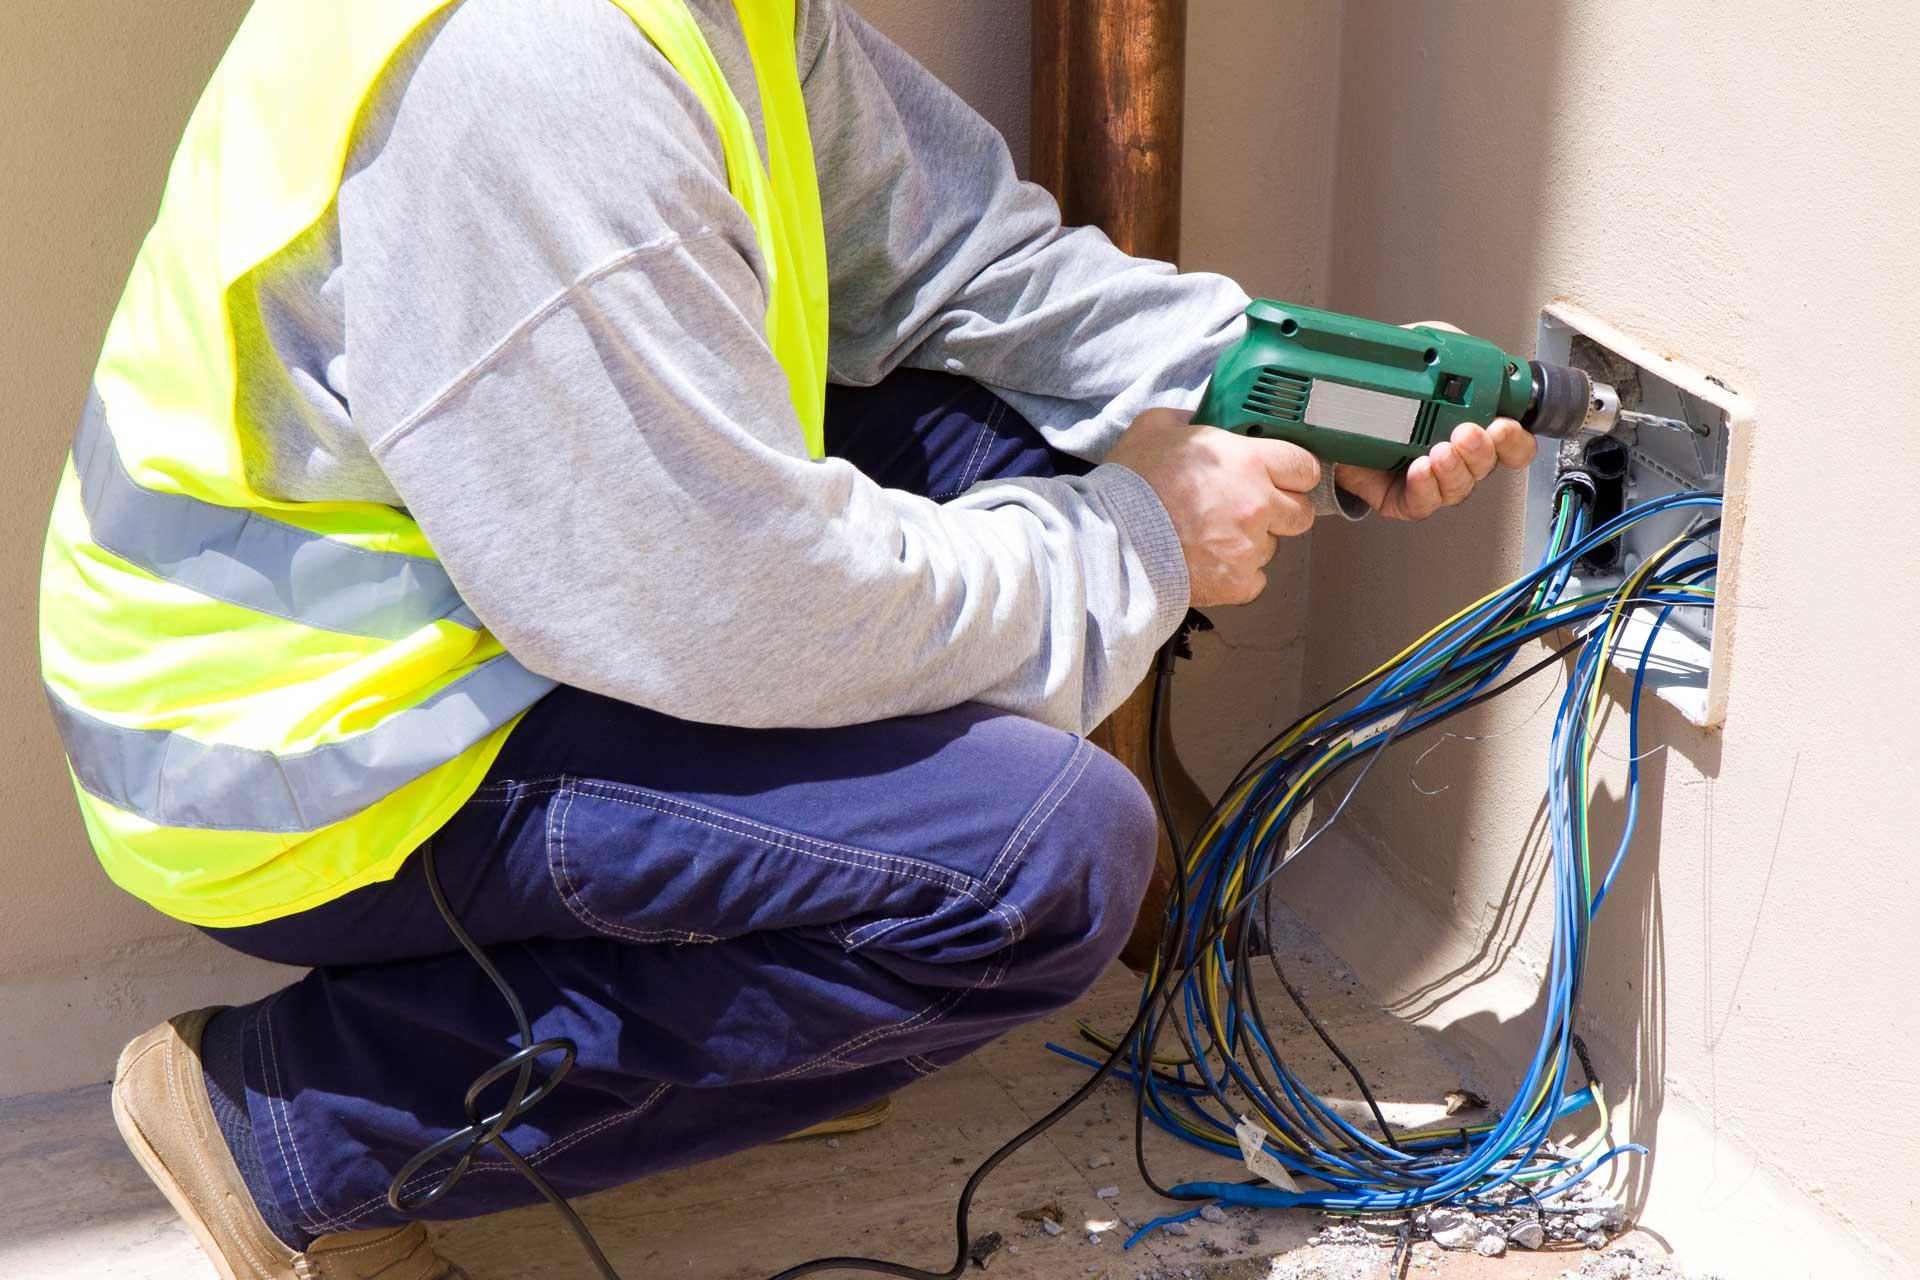 Epic Electric Kelowna Electrician Installing Electrical Panel Proper Wiring